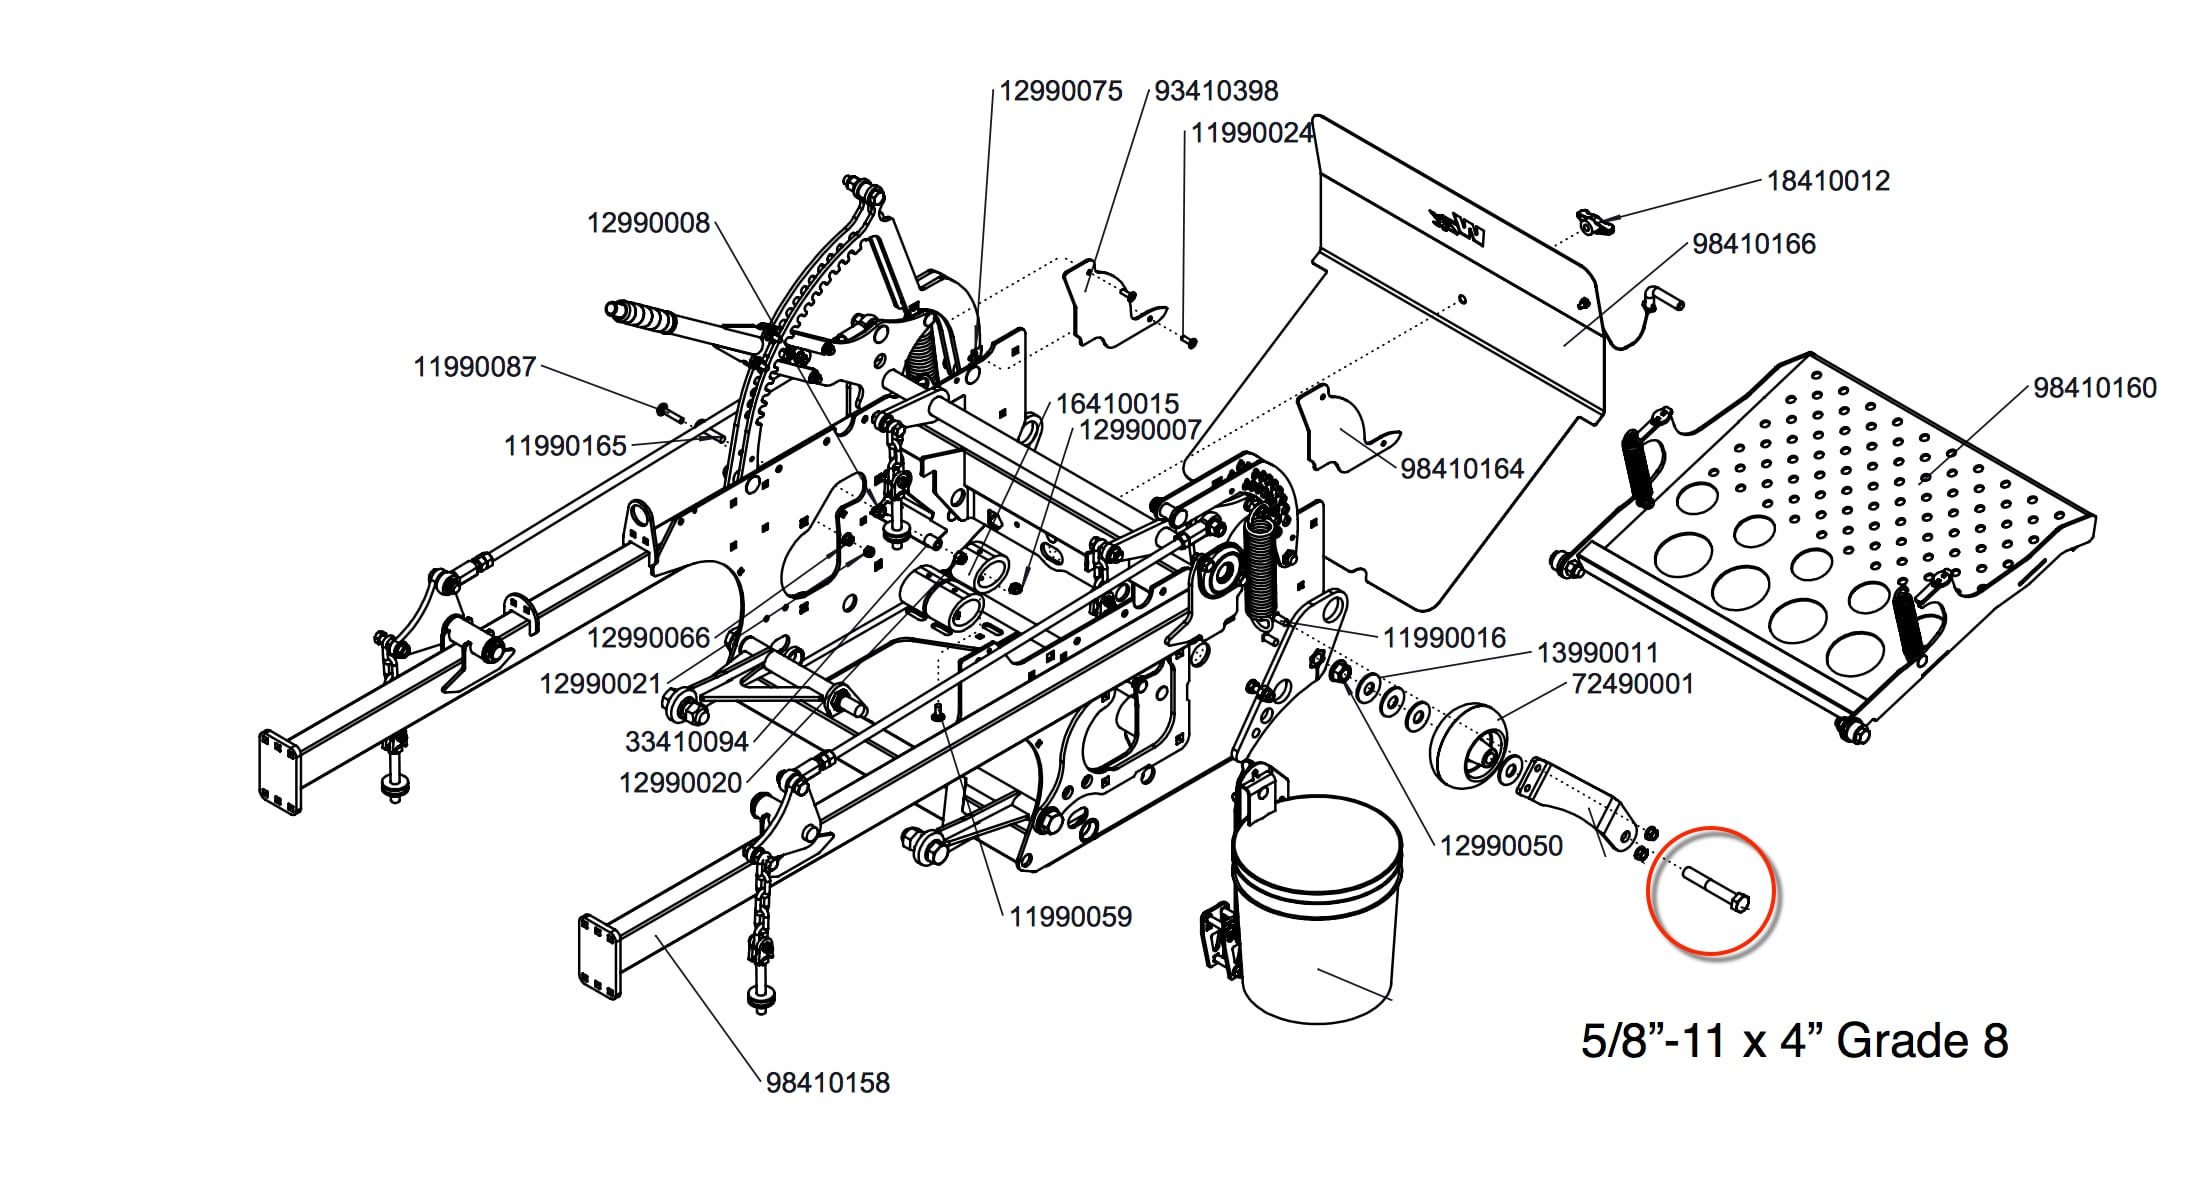 Wright Stander Mower Wiring Diagram - Eia 568b Wiring Diagram -  clubcar.yenpancane.jeanjaures37.fr | Wright Stander Wiring Diagram |  | Wiring Diagram Resource